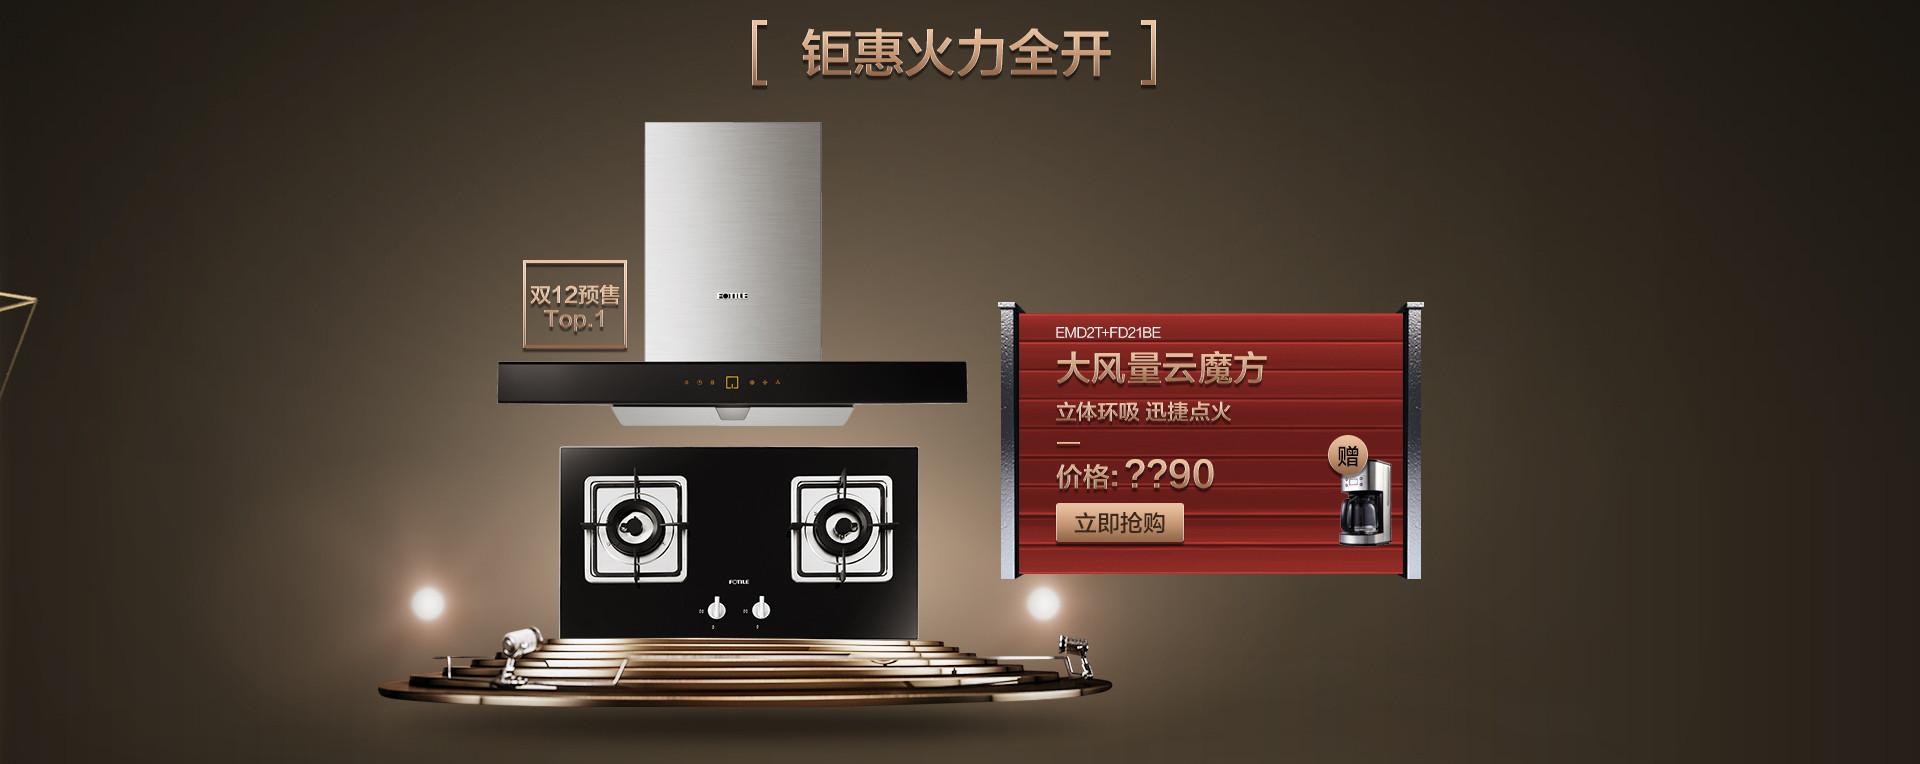 http://image.suning.cn/uimg/sop/commodity/228839527446057718770000_x.jpg